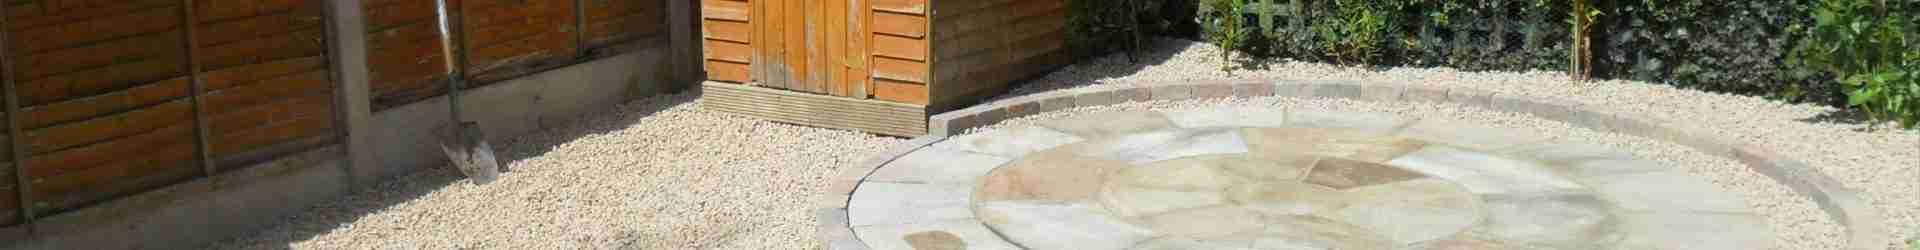 Low Maintenace Garden ,Indian Sandstone Patio, Bryanstown Manor, Drogheda co.Louth